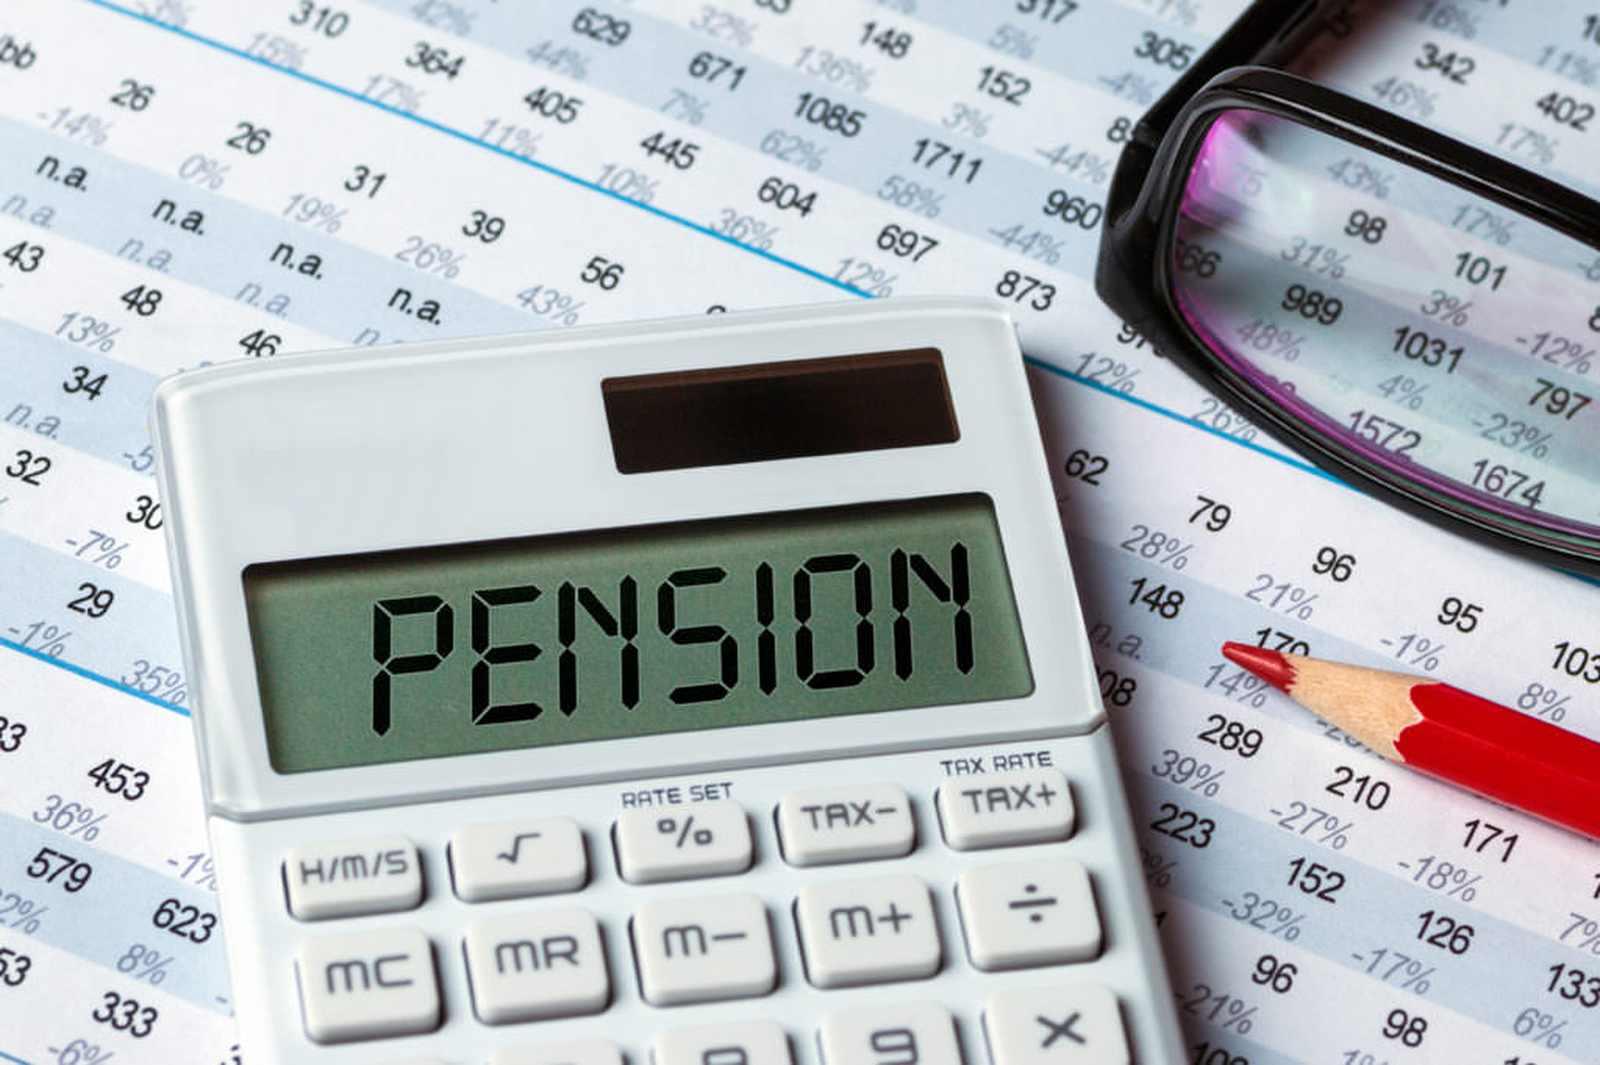 The Pension Gap